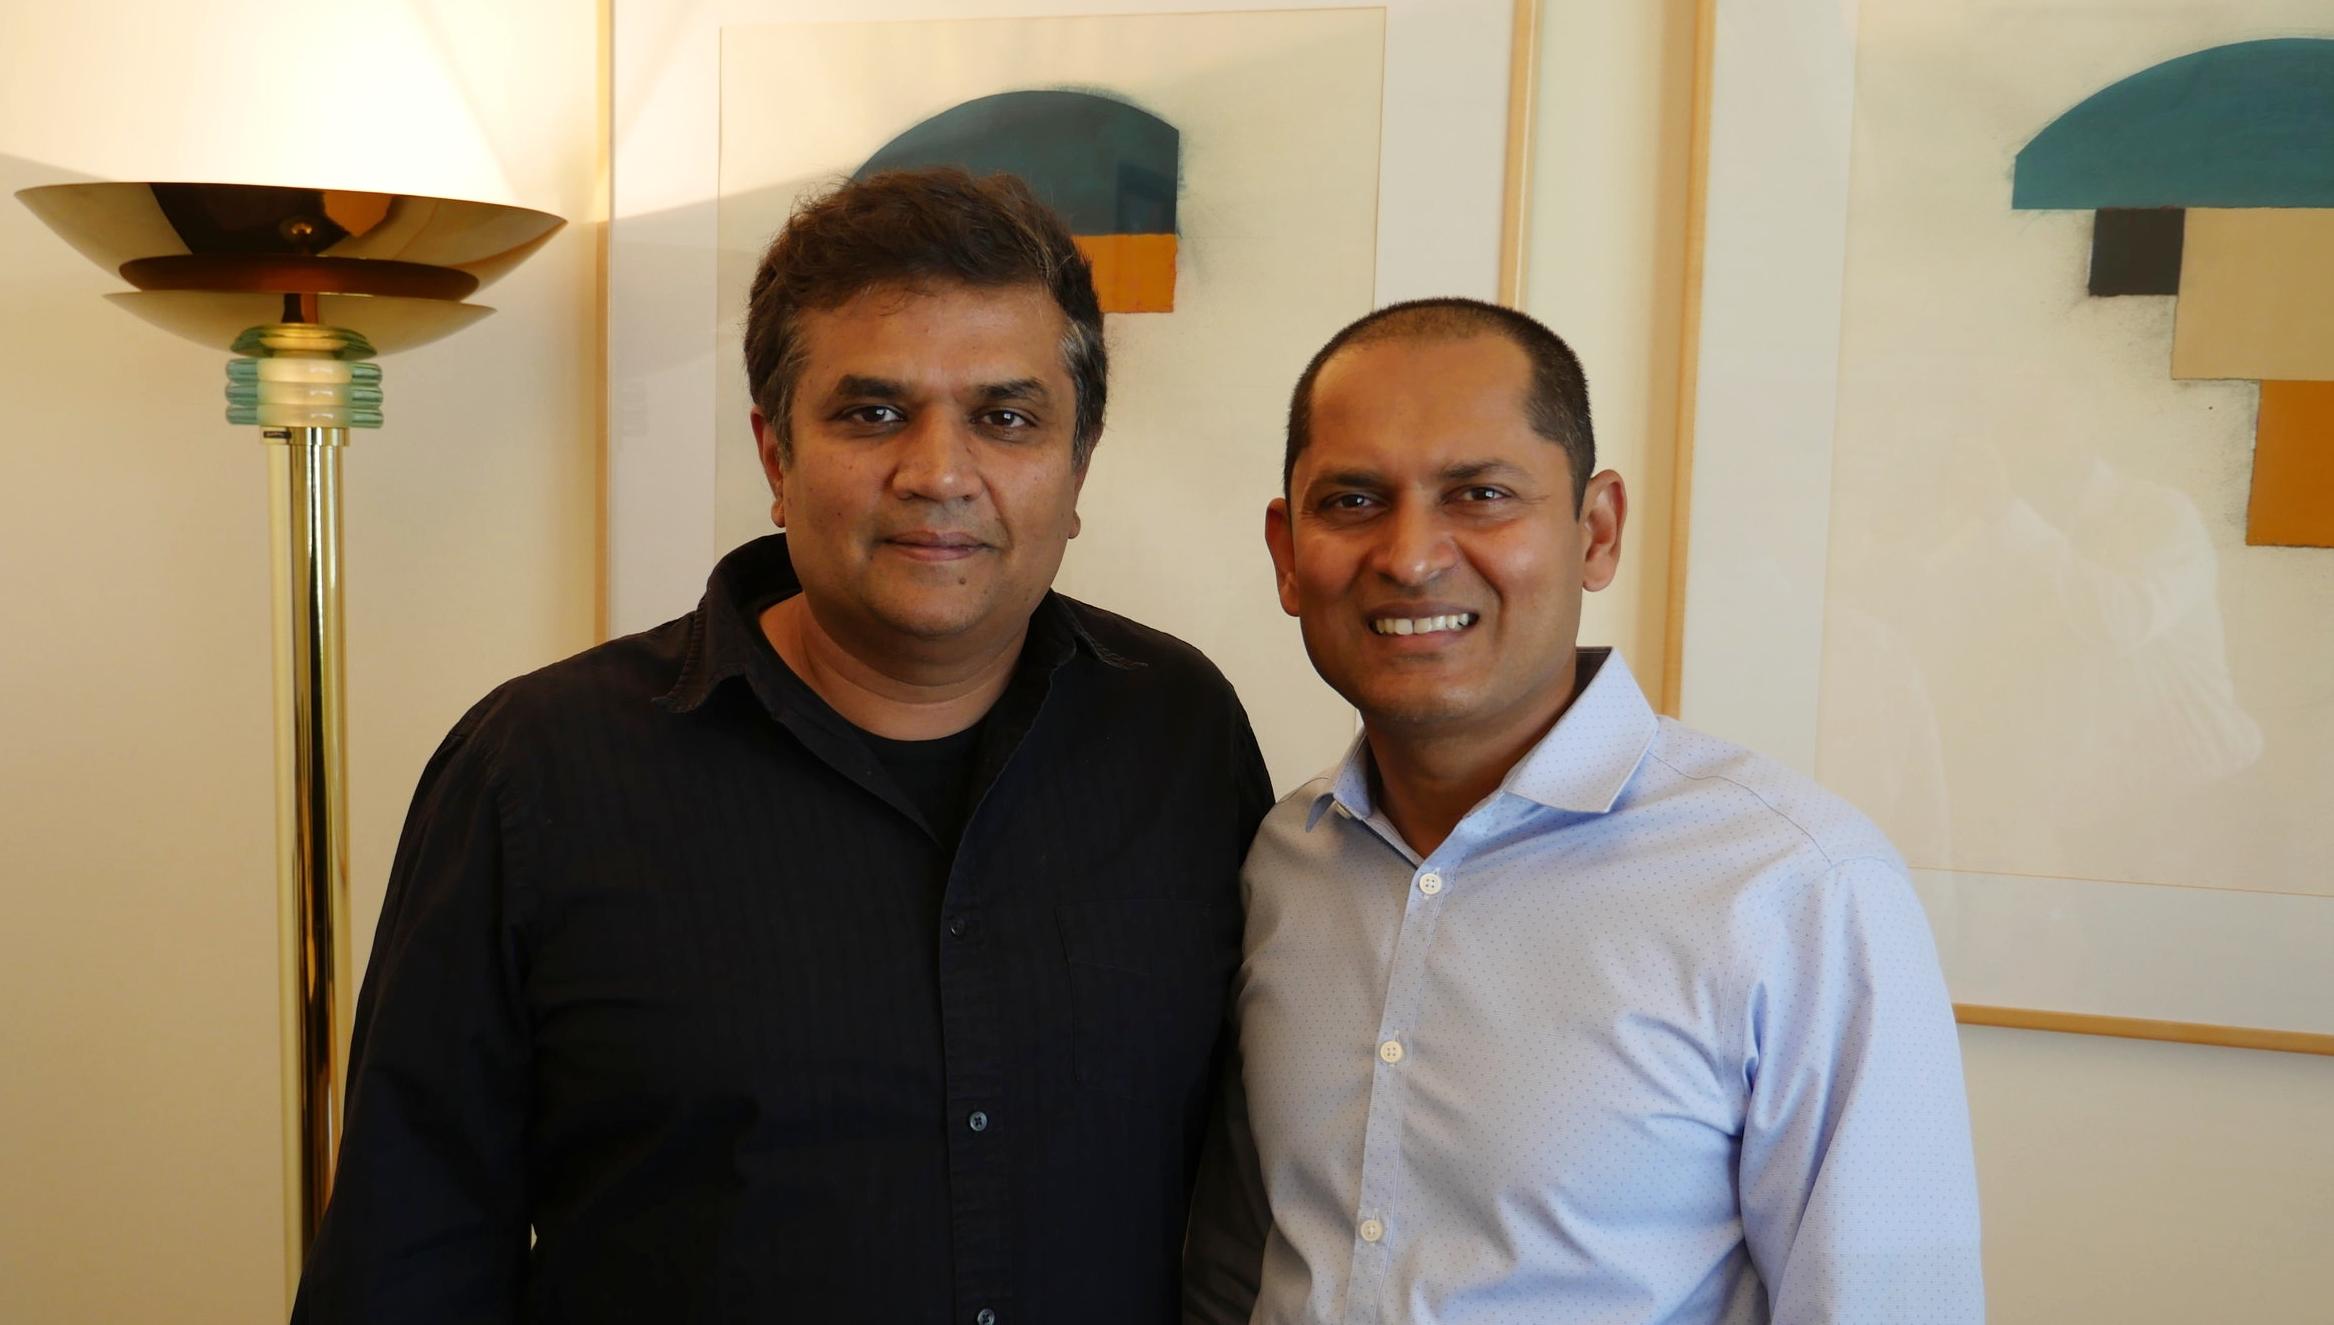 Dinesh and Srini